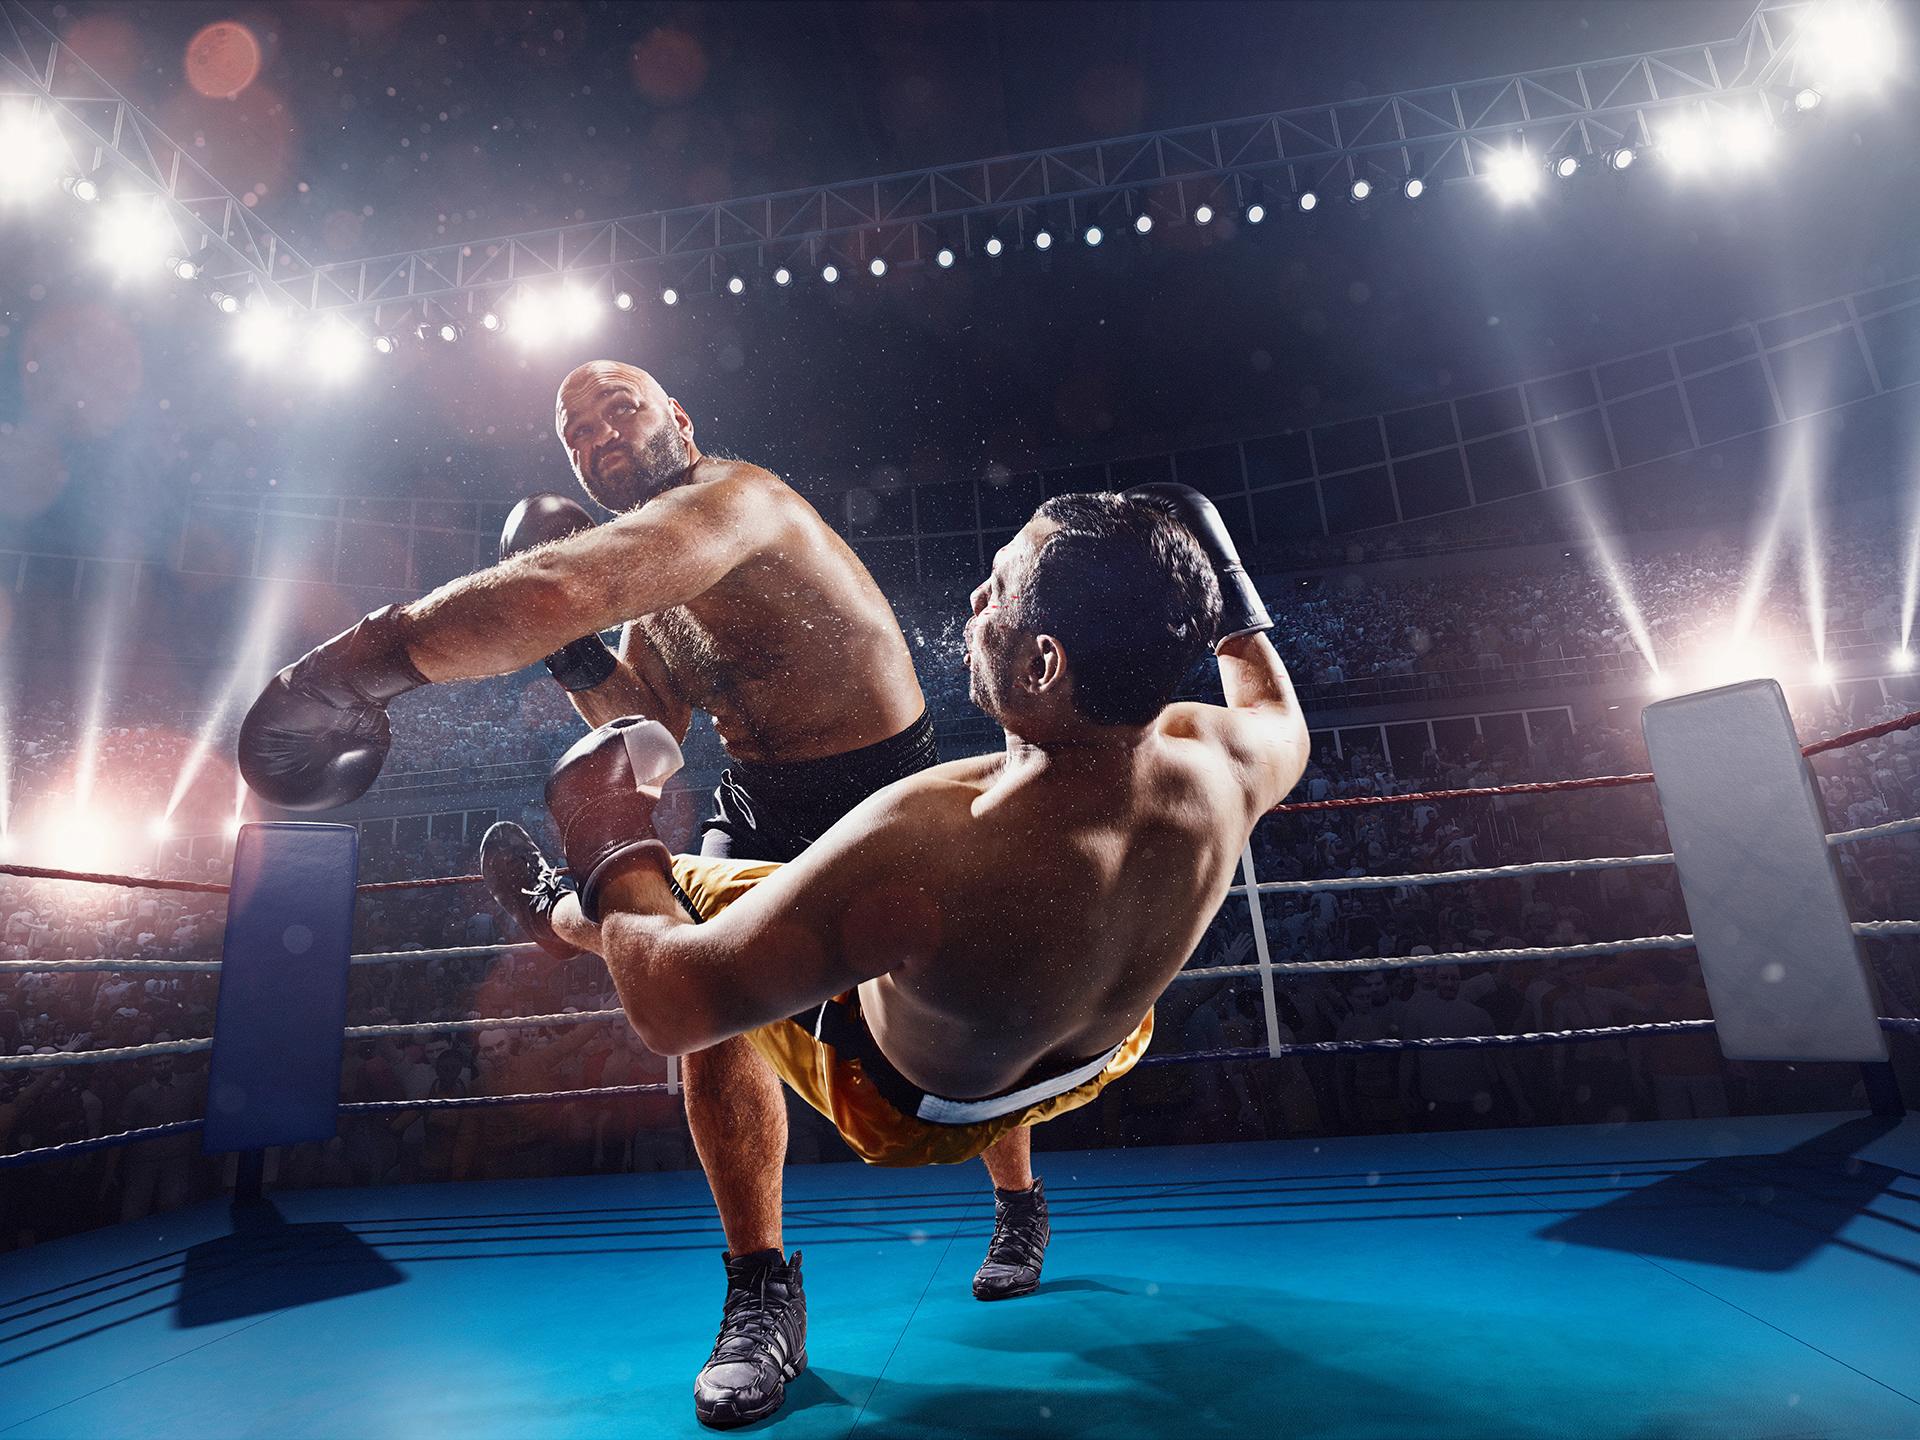 Картинка бой на ринге